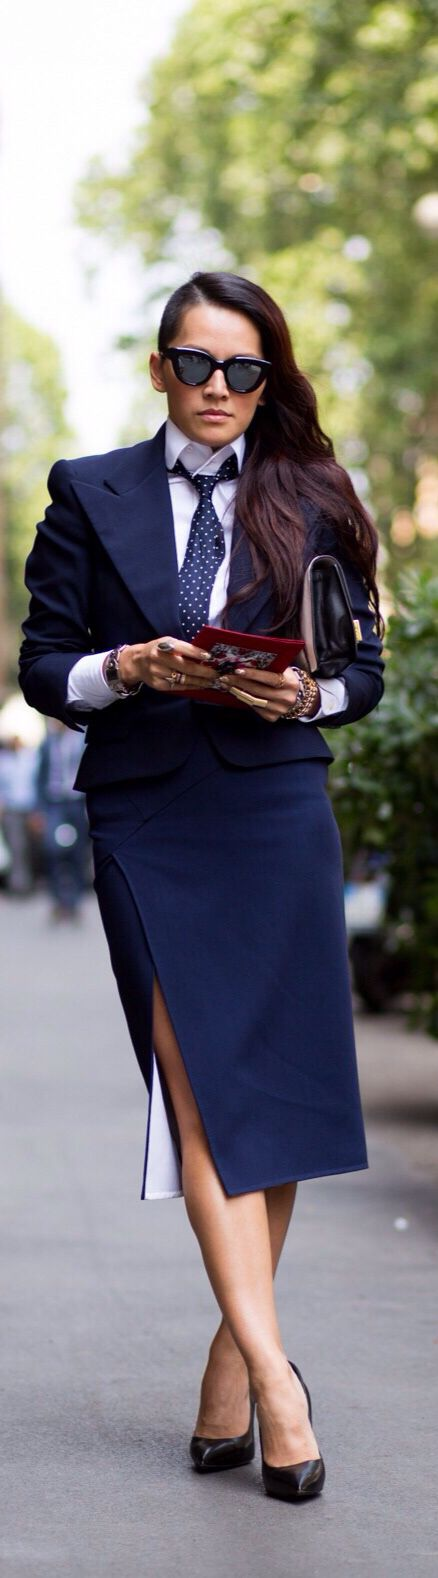 Wardrobe must-have - business costume:Tina Leung